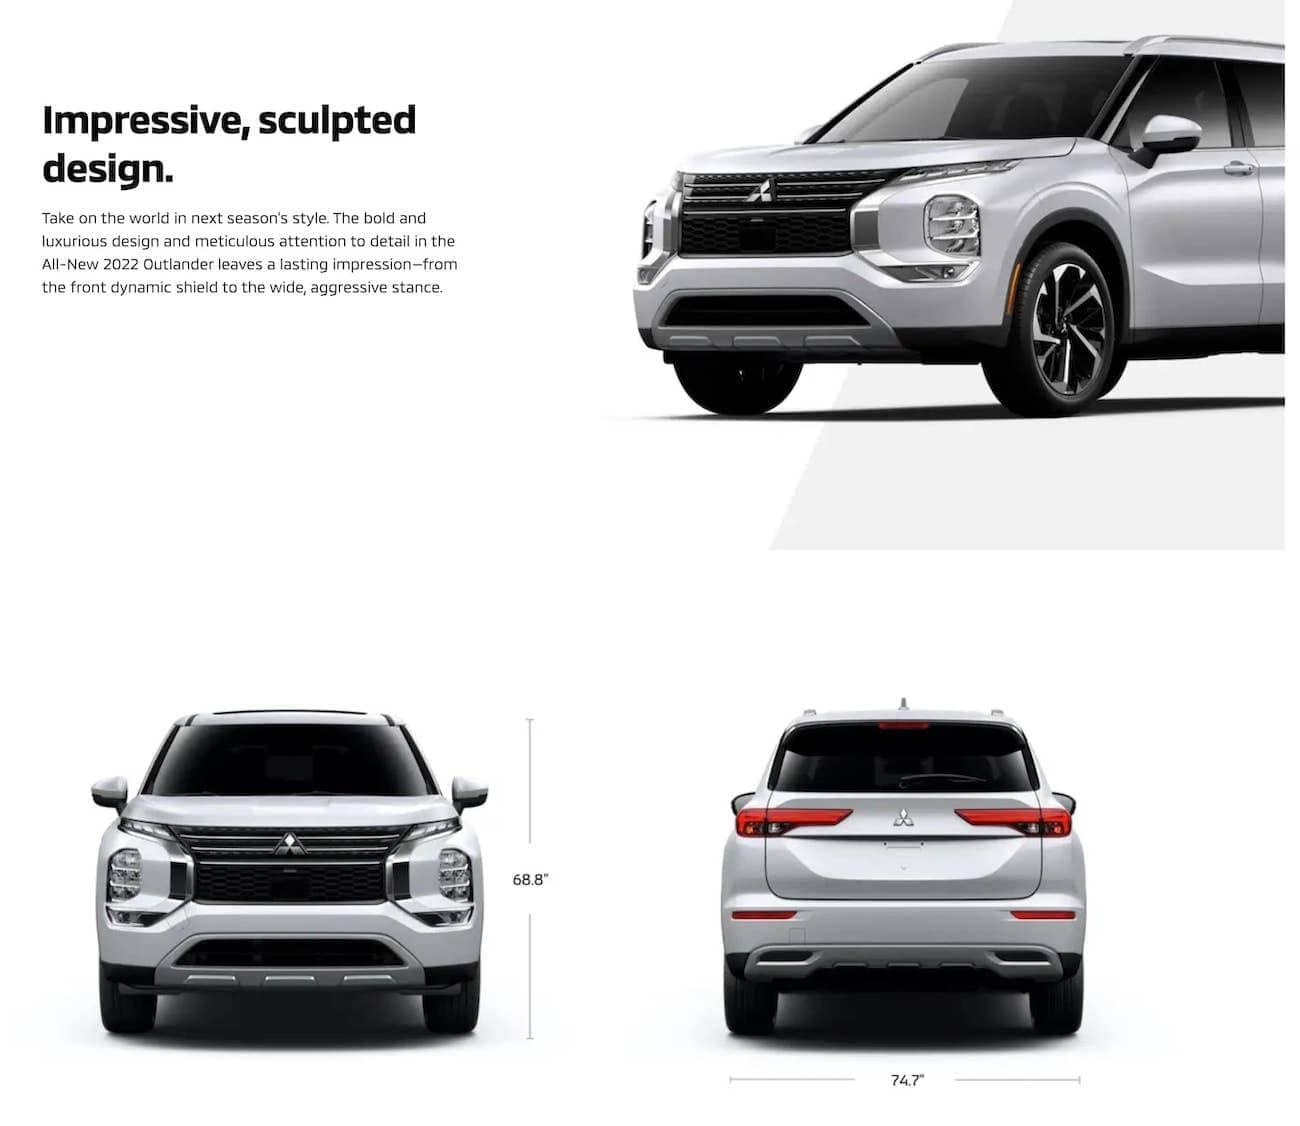 2022 Mitsubishi Outlander Sculpted Design